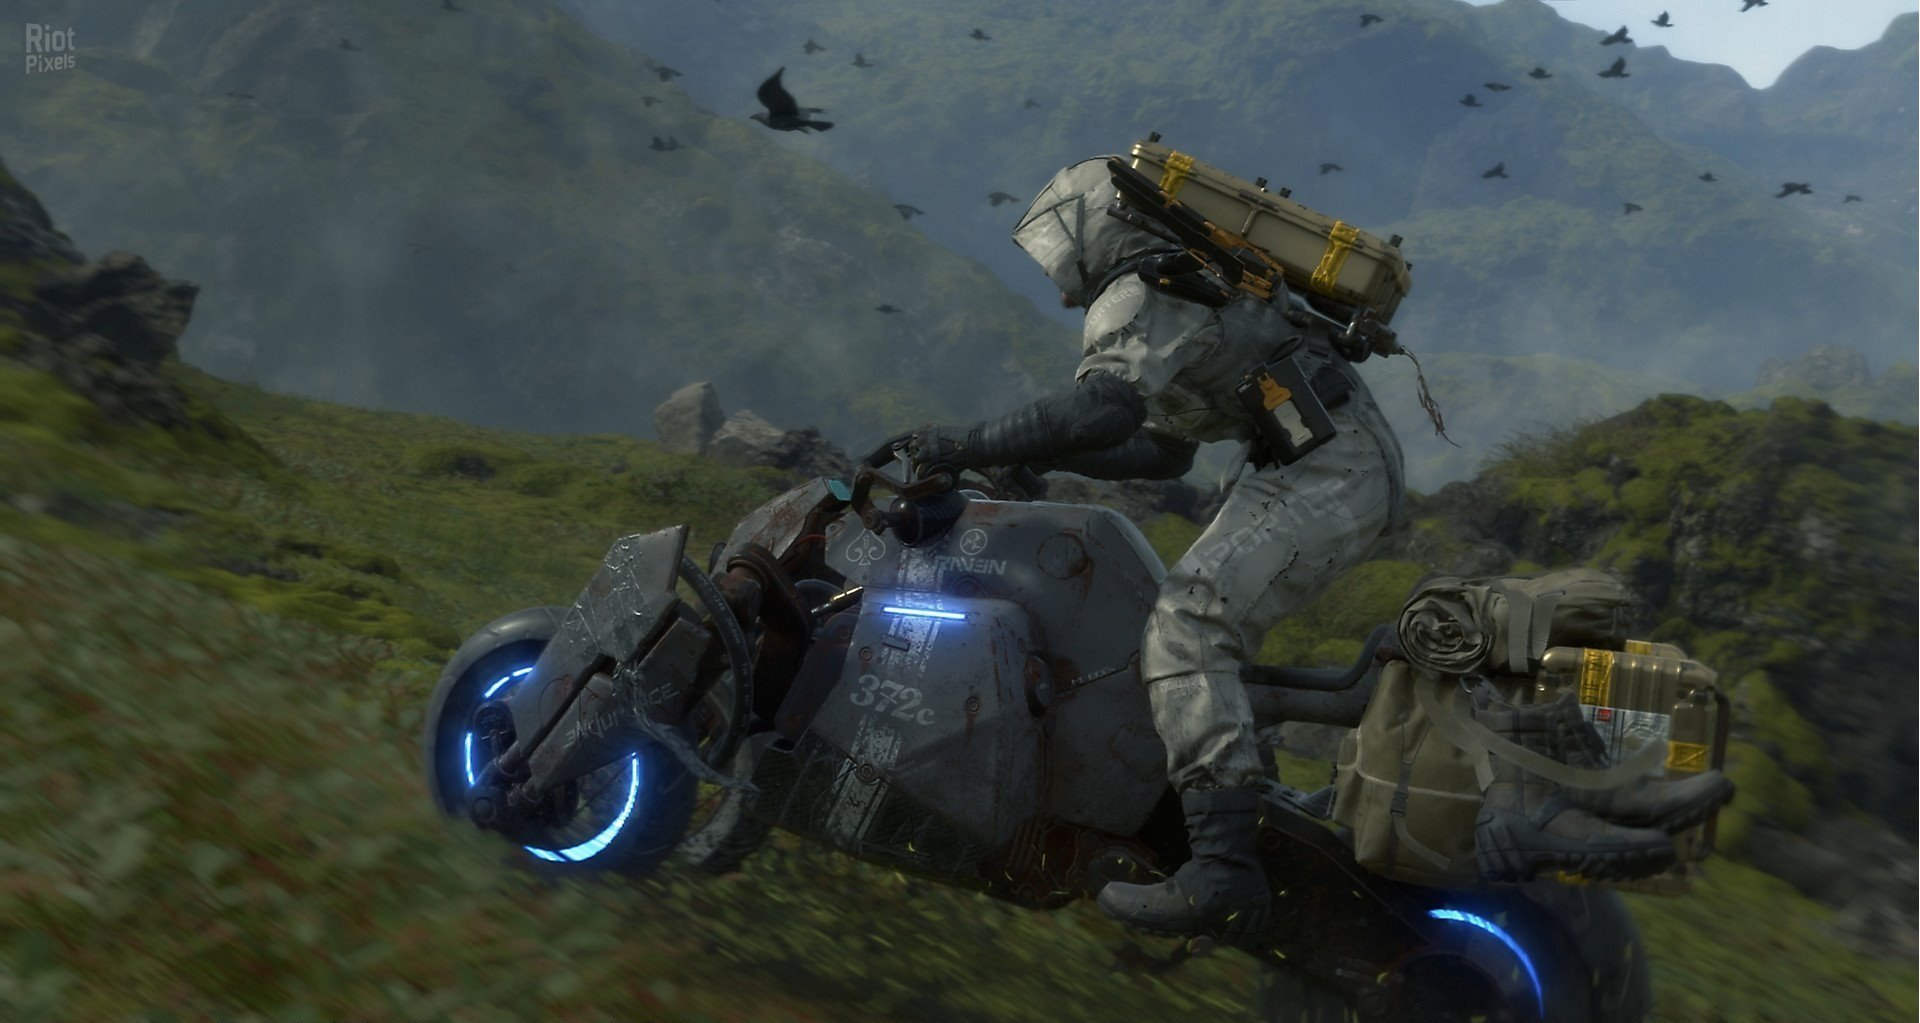 Screenshot for the game DEATH STRANDING [V. 1.02+DLC] (2020) download torrent RePack from R. G. Mechanics